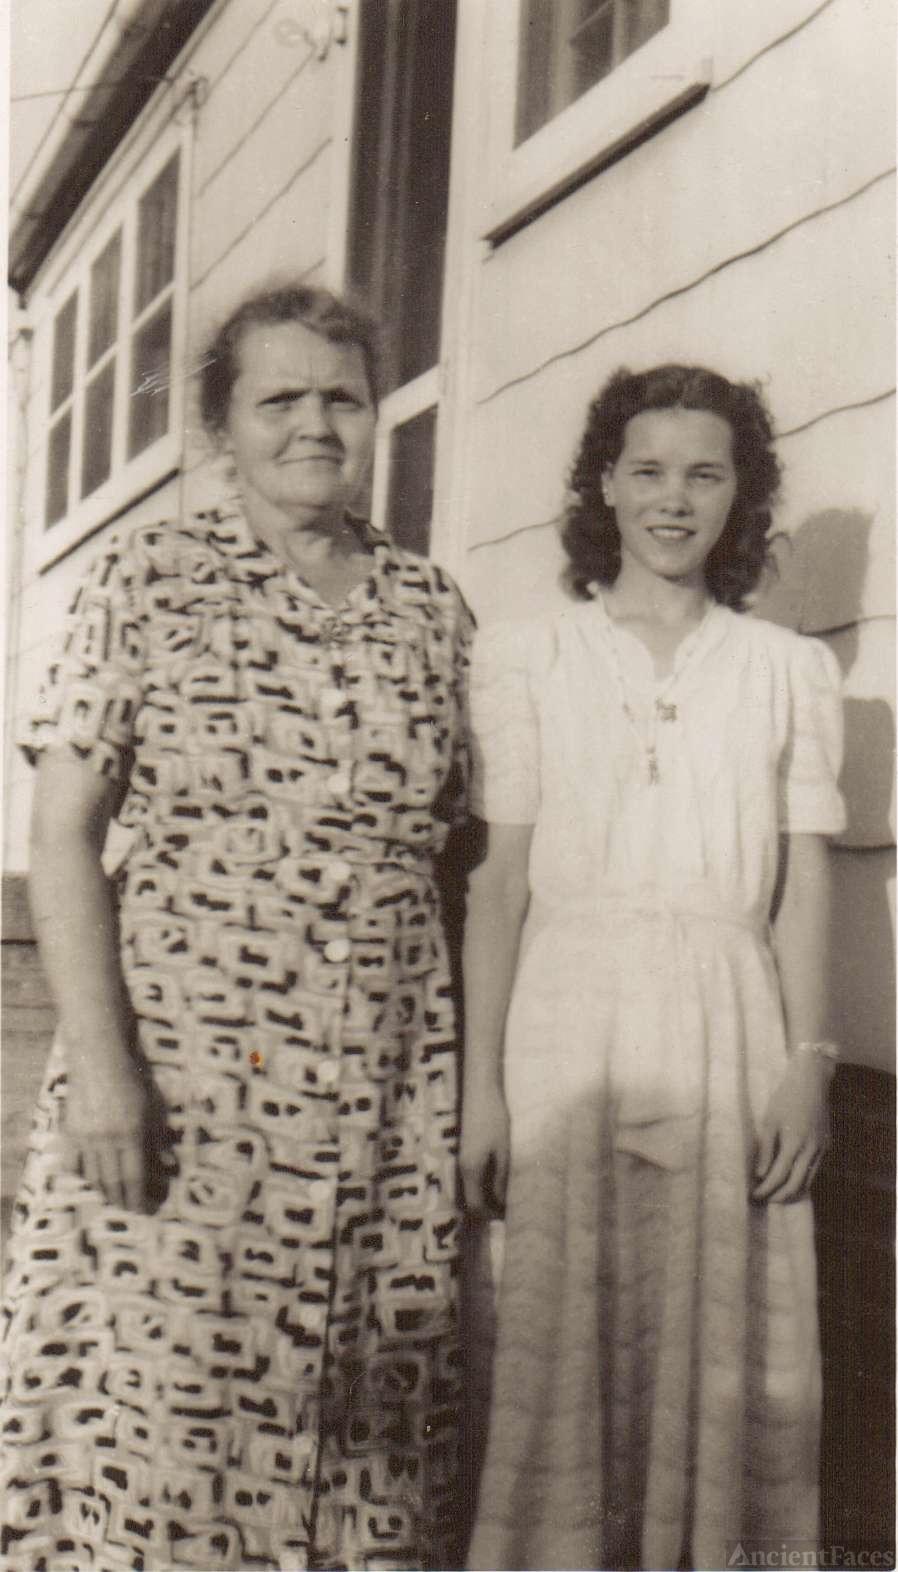 Estella and Frances Shell